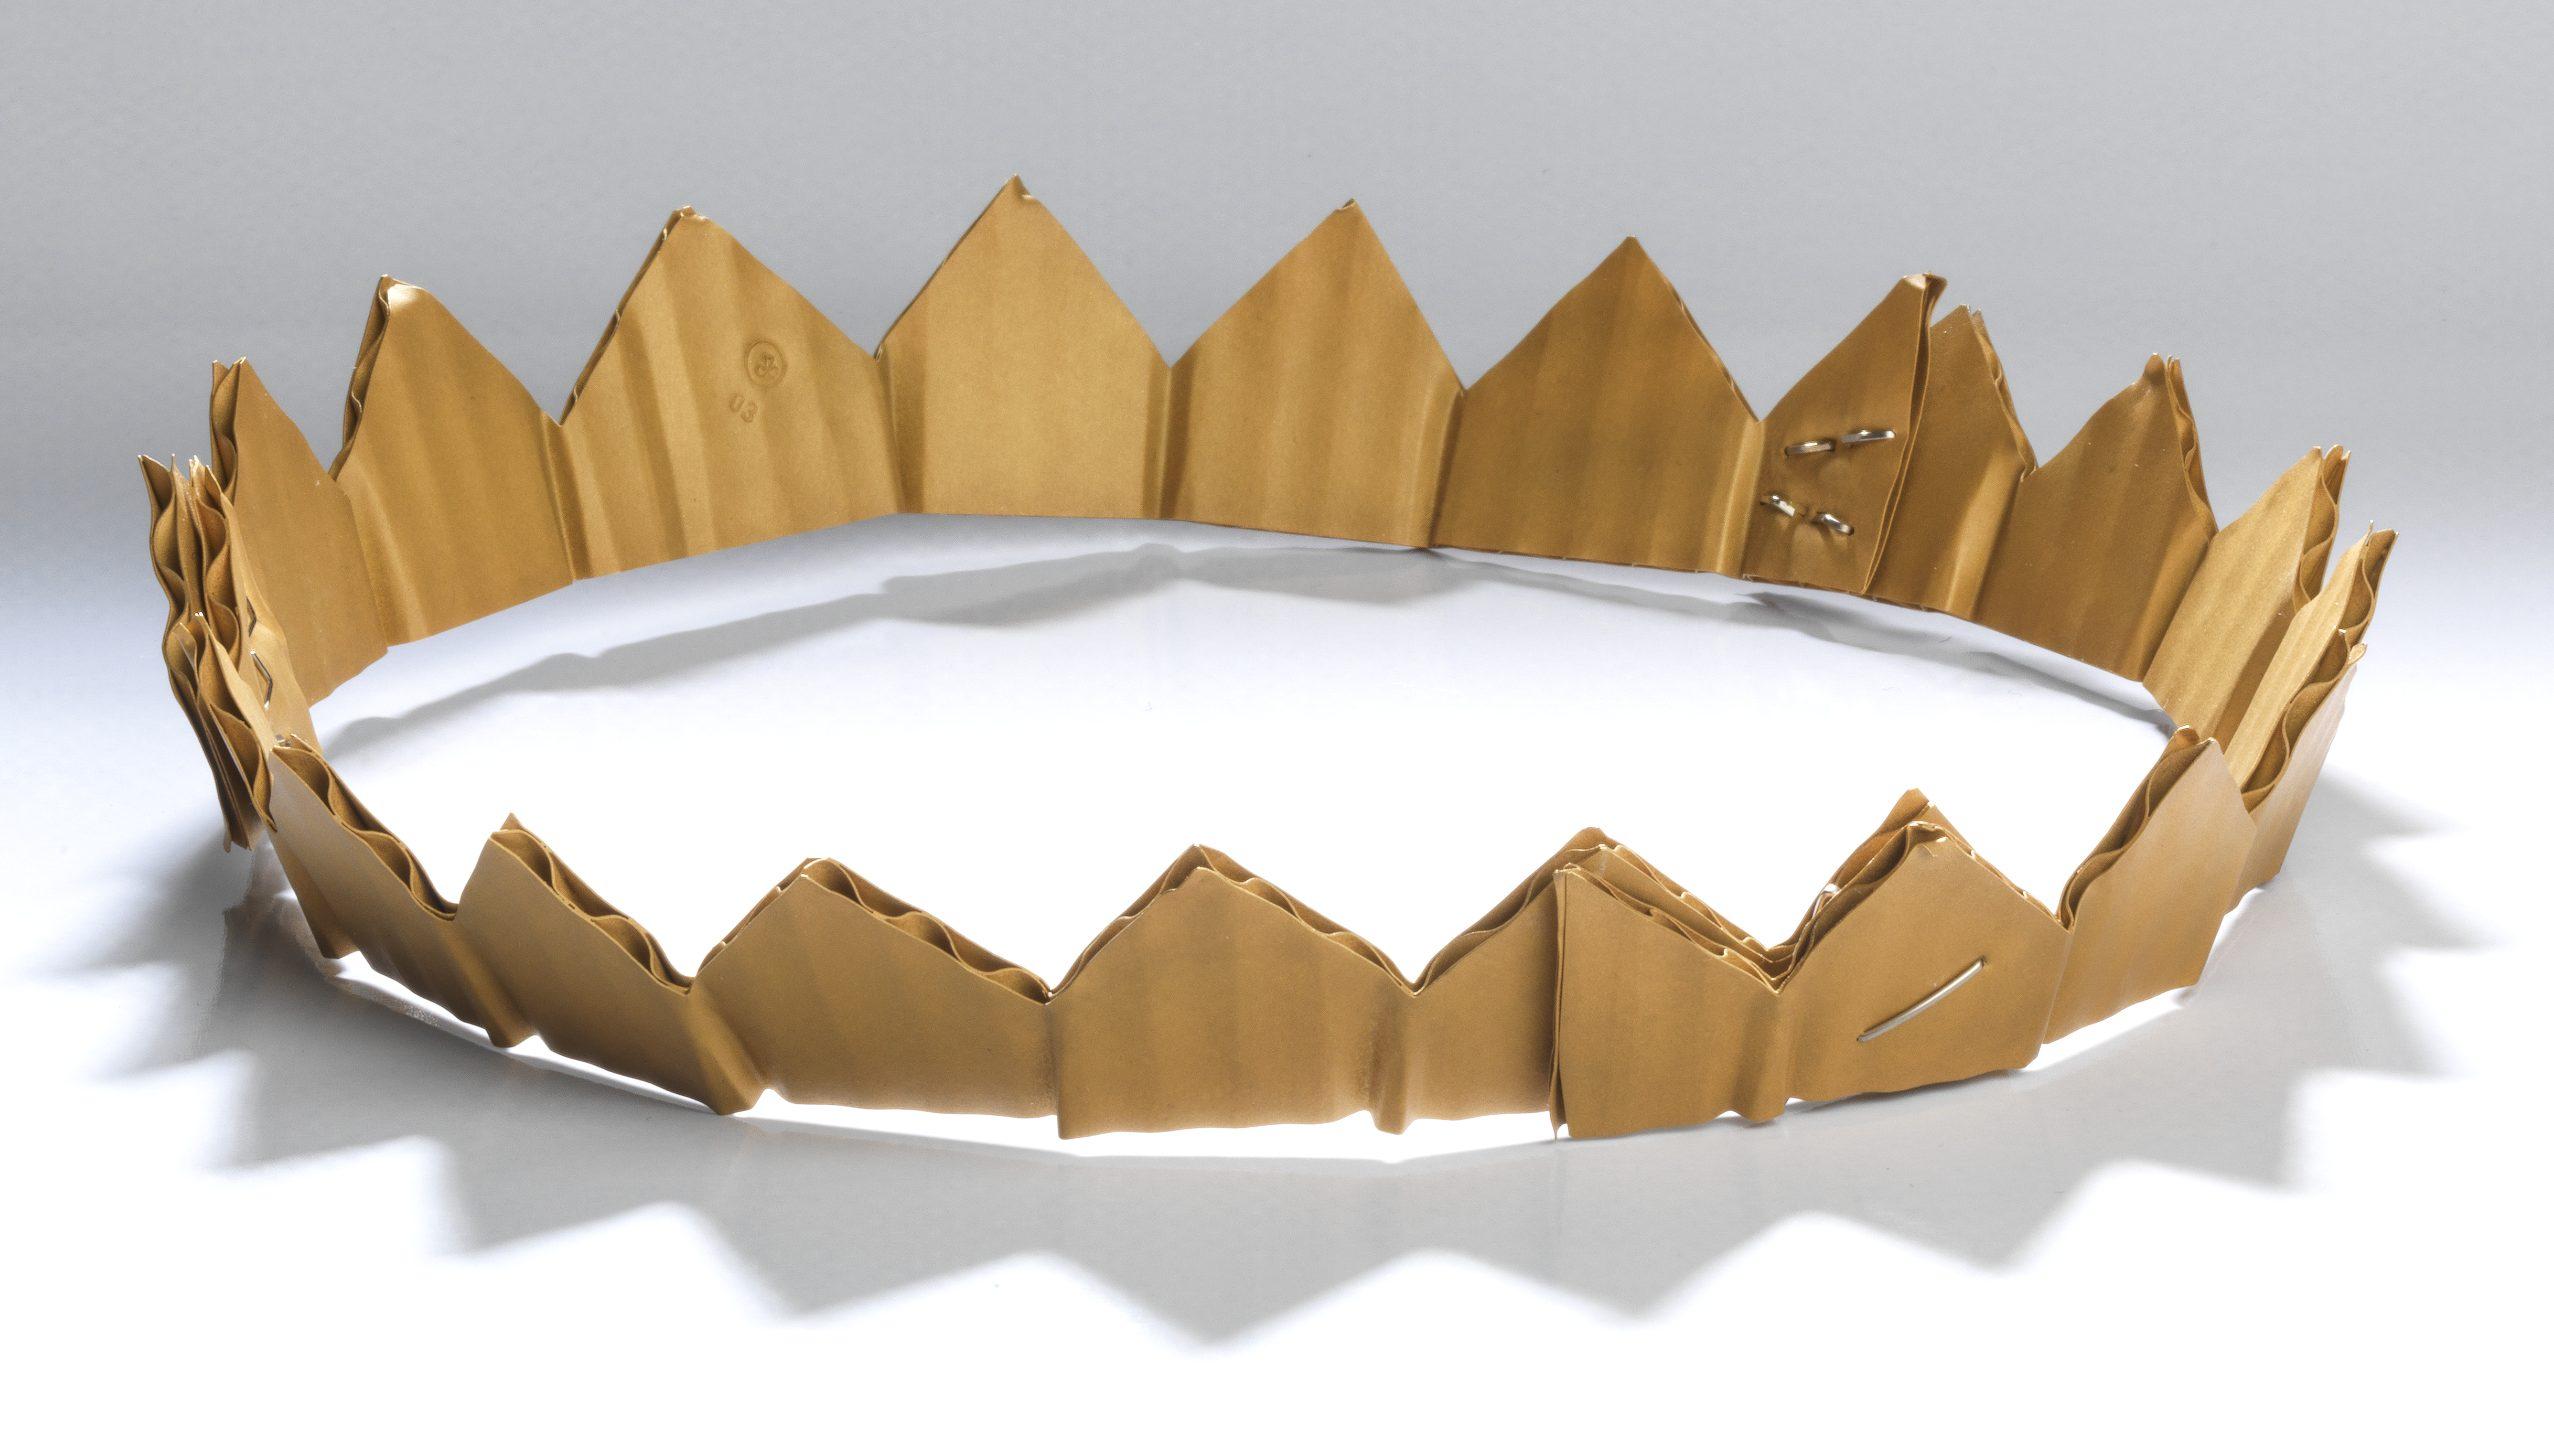 David Bielander, Cardboard Crown, kroon, 2015. Collectie MAD. Foto MAD, goud, witgoud